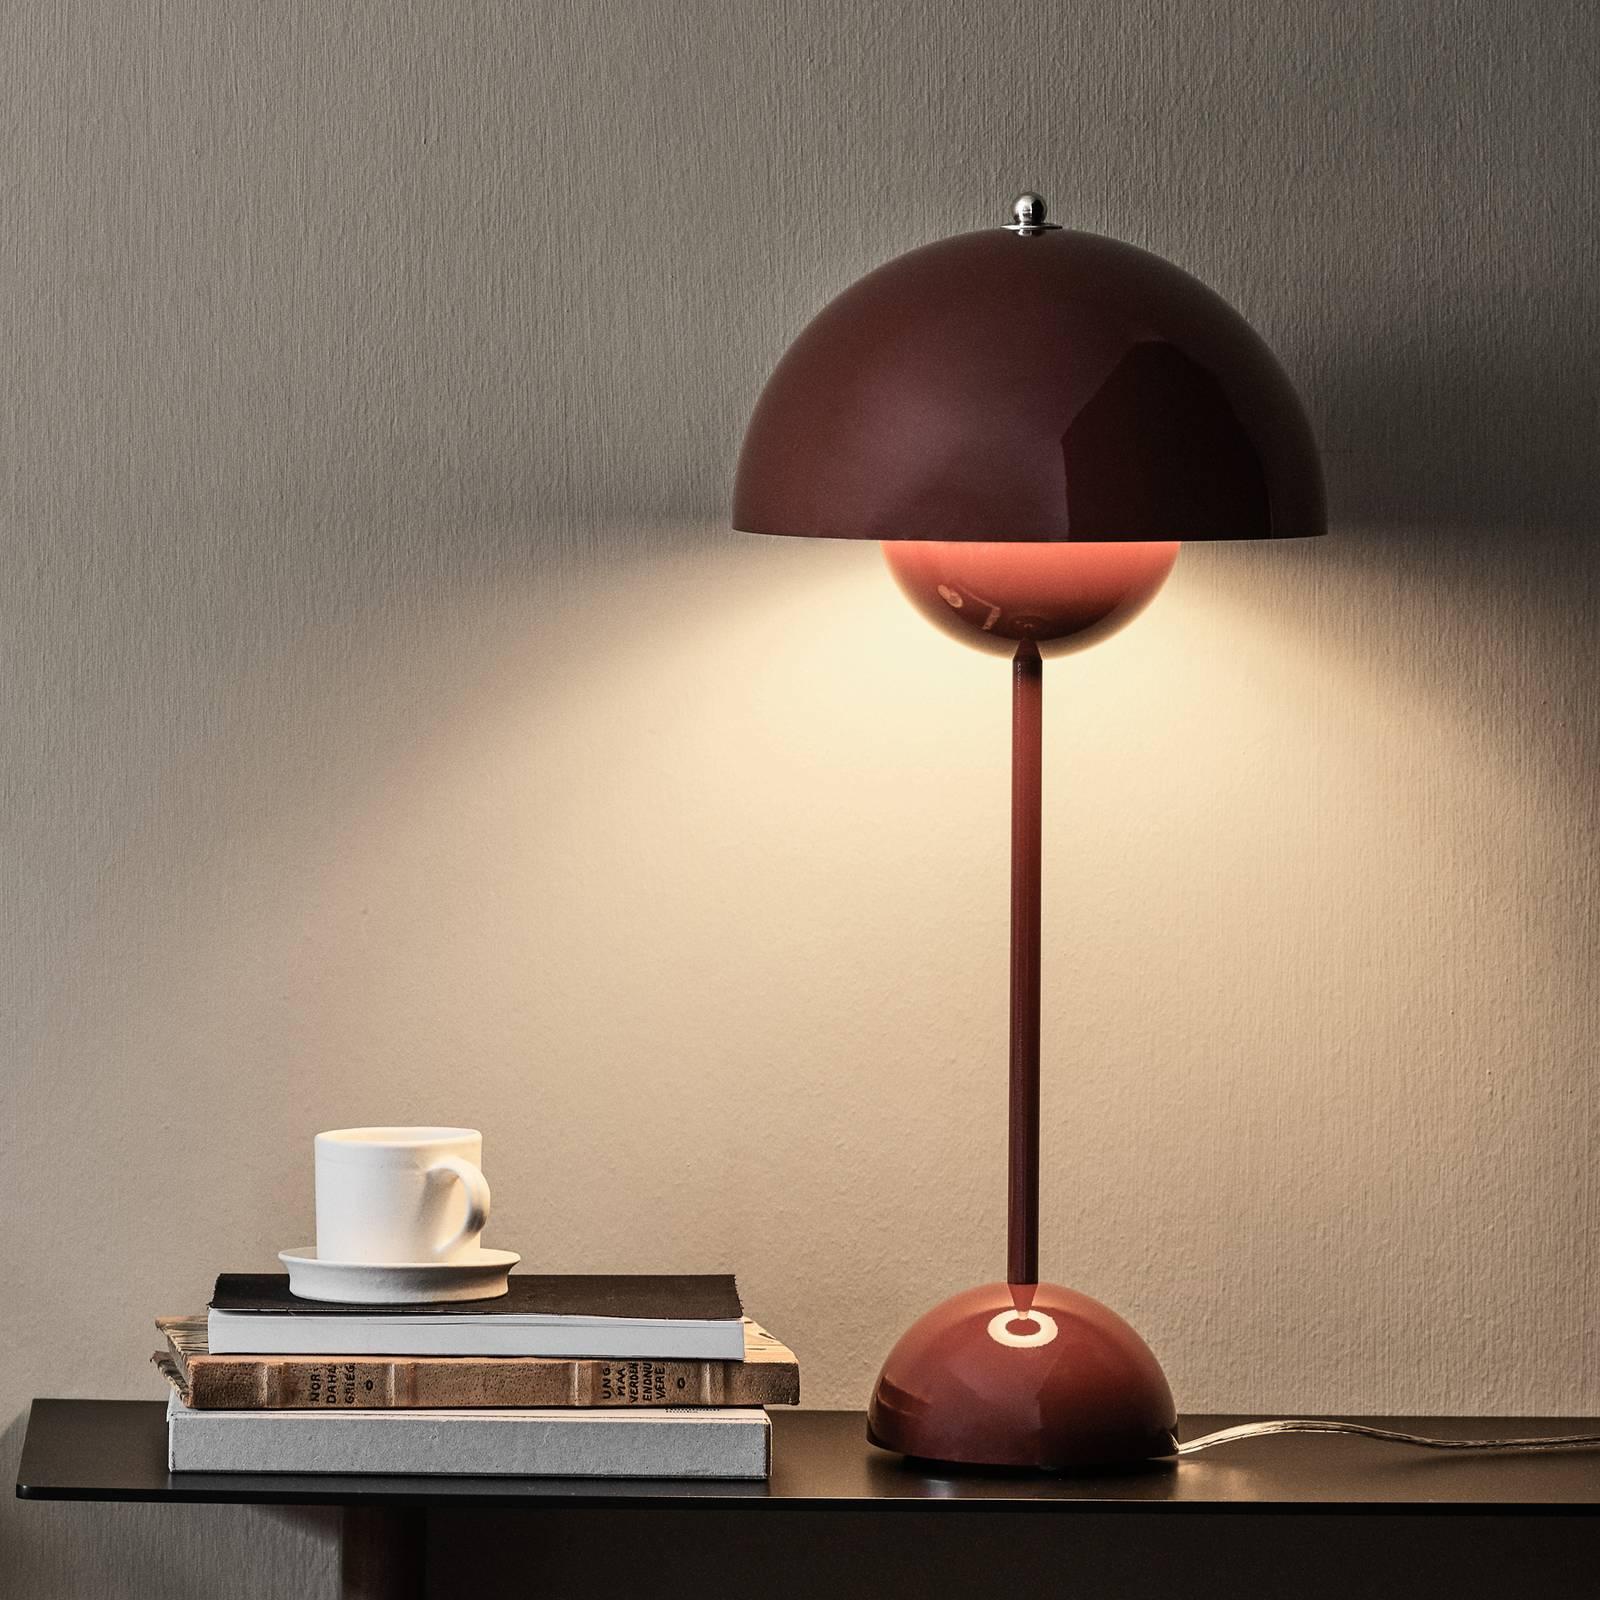 &Tradition Flowerpot VP3 -pöytälamppu, punaruskea